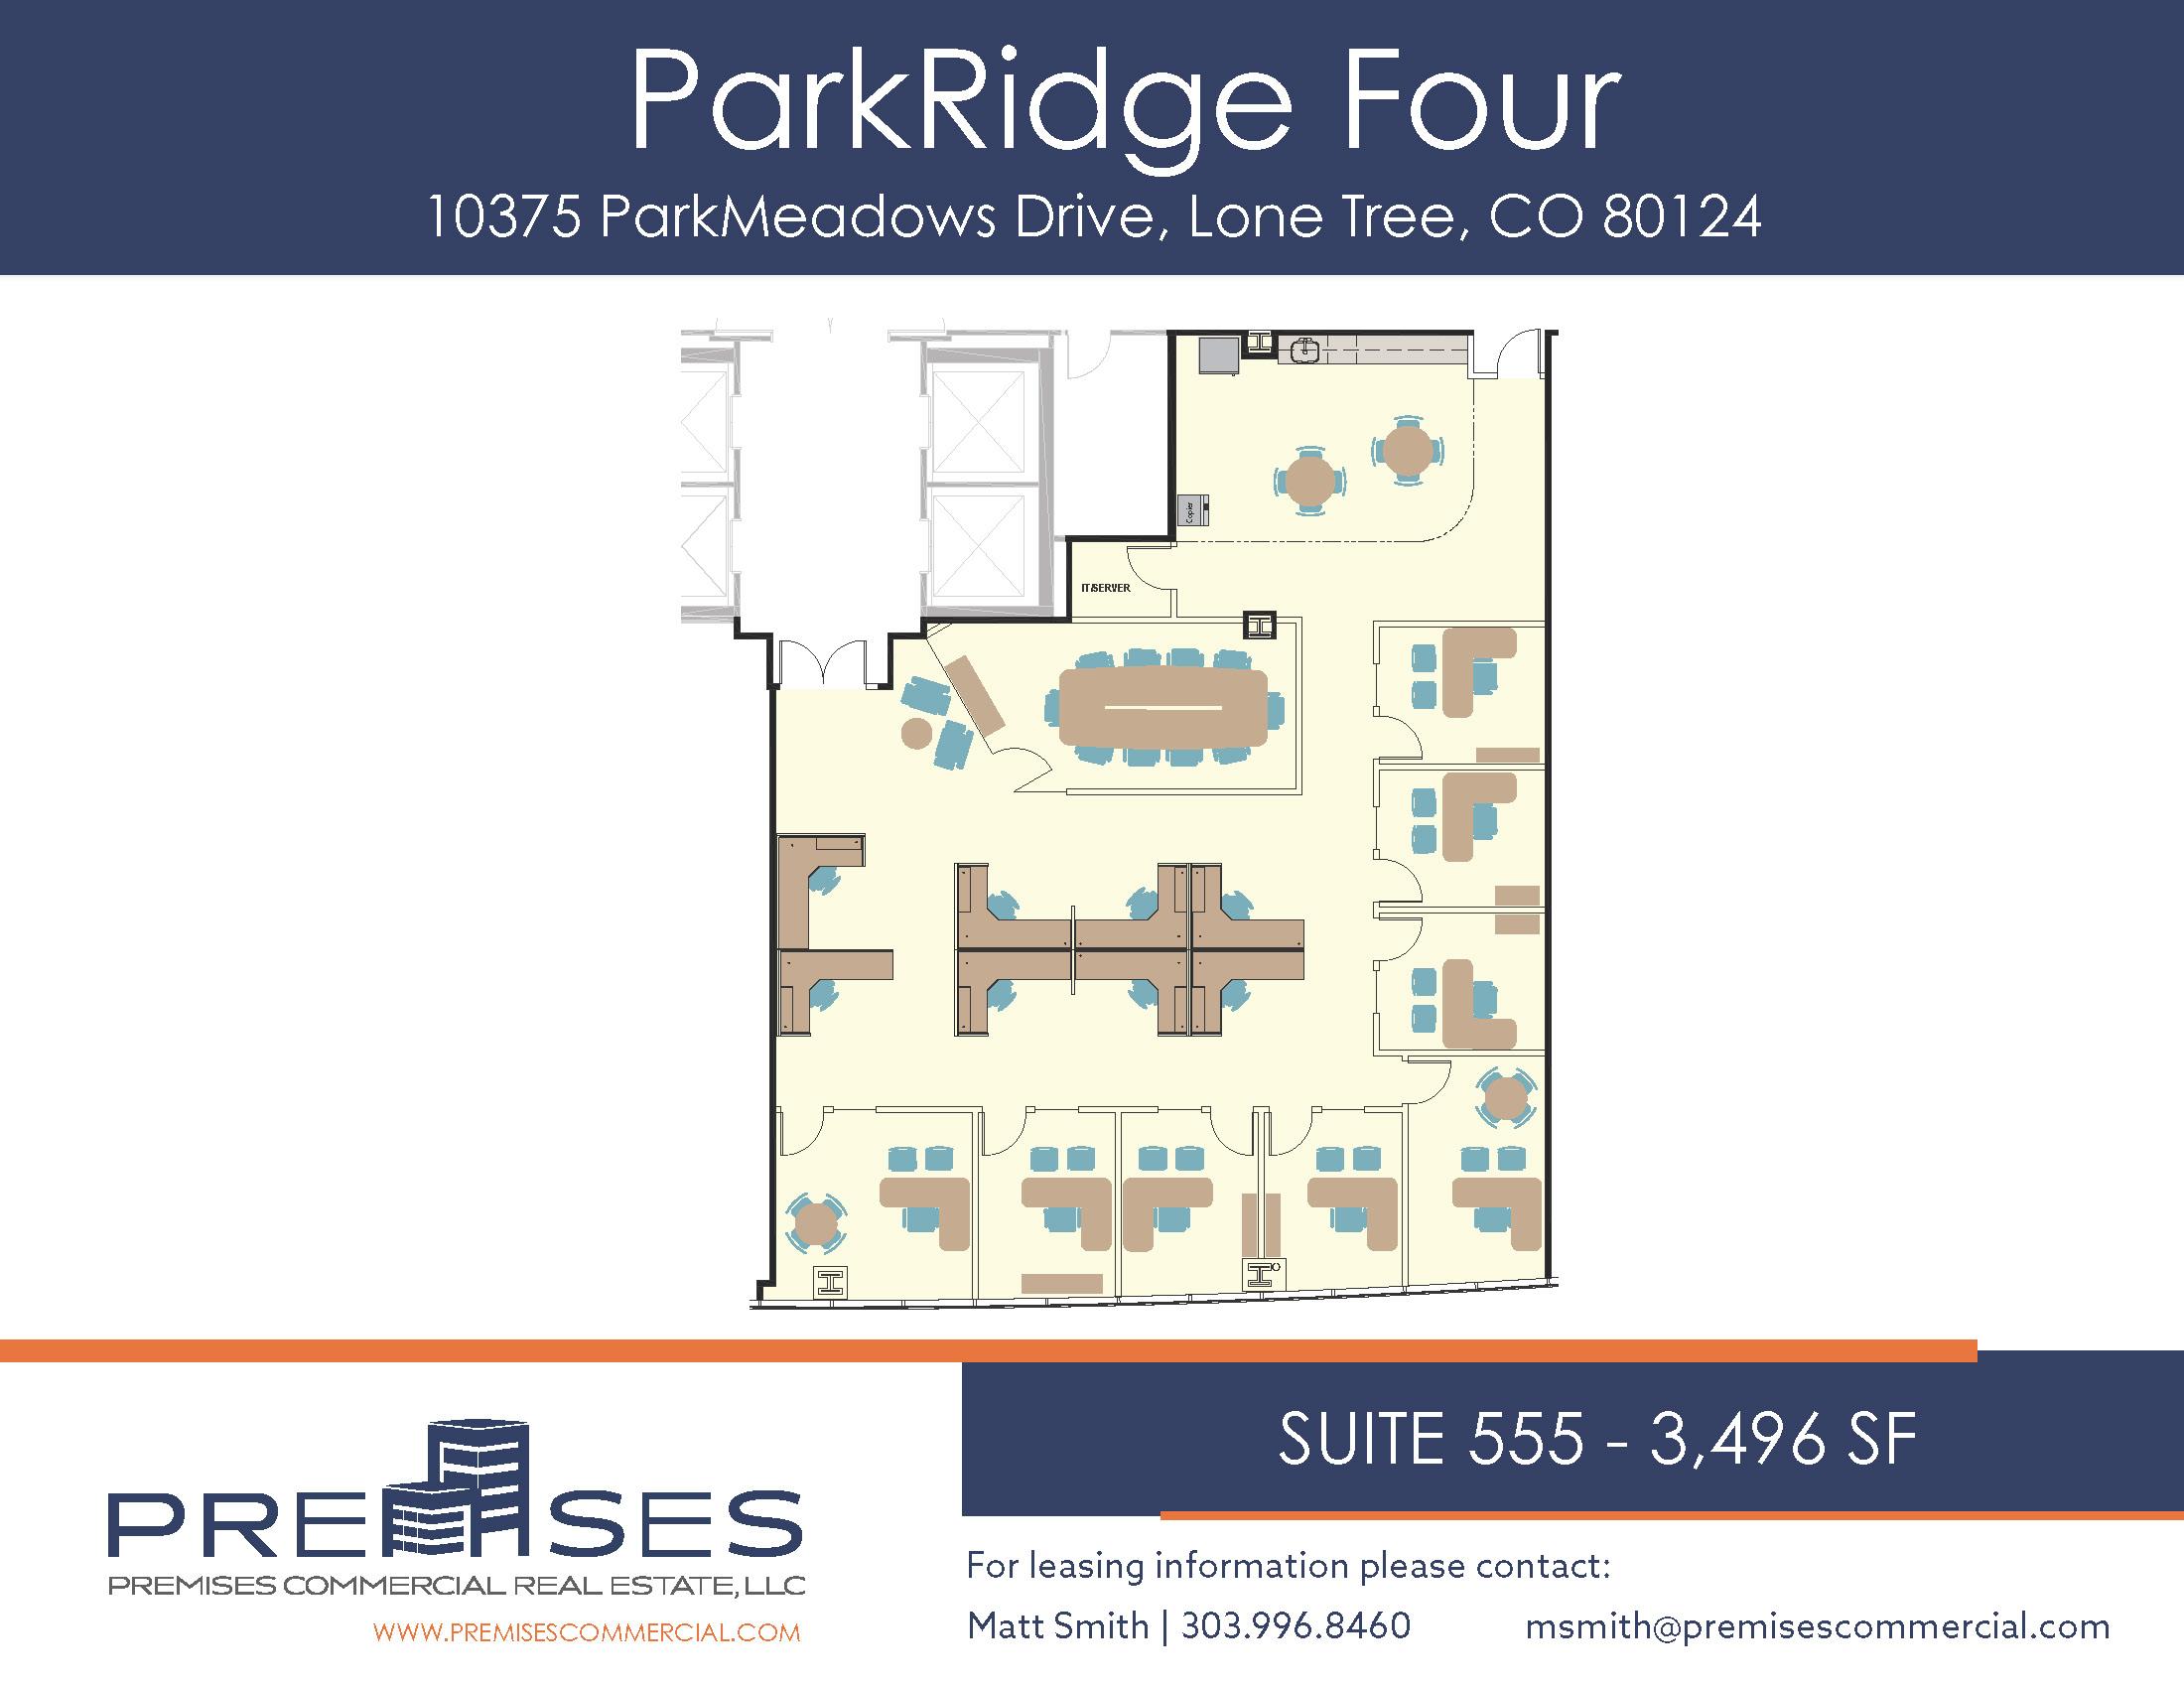 Suite 555 - 3,496 sf